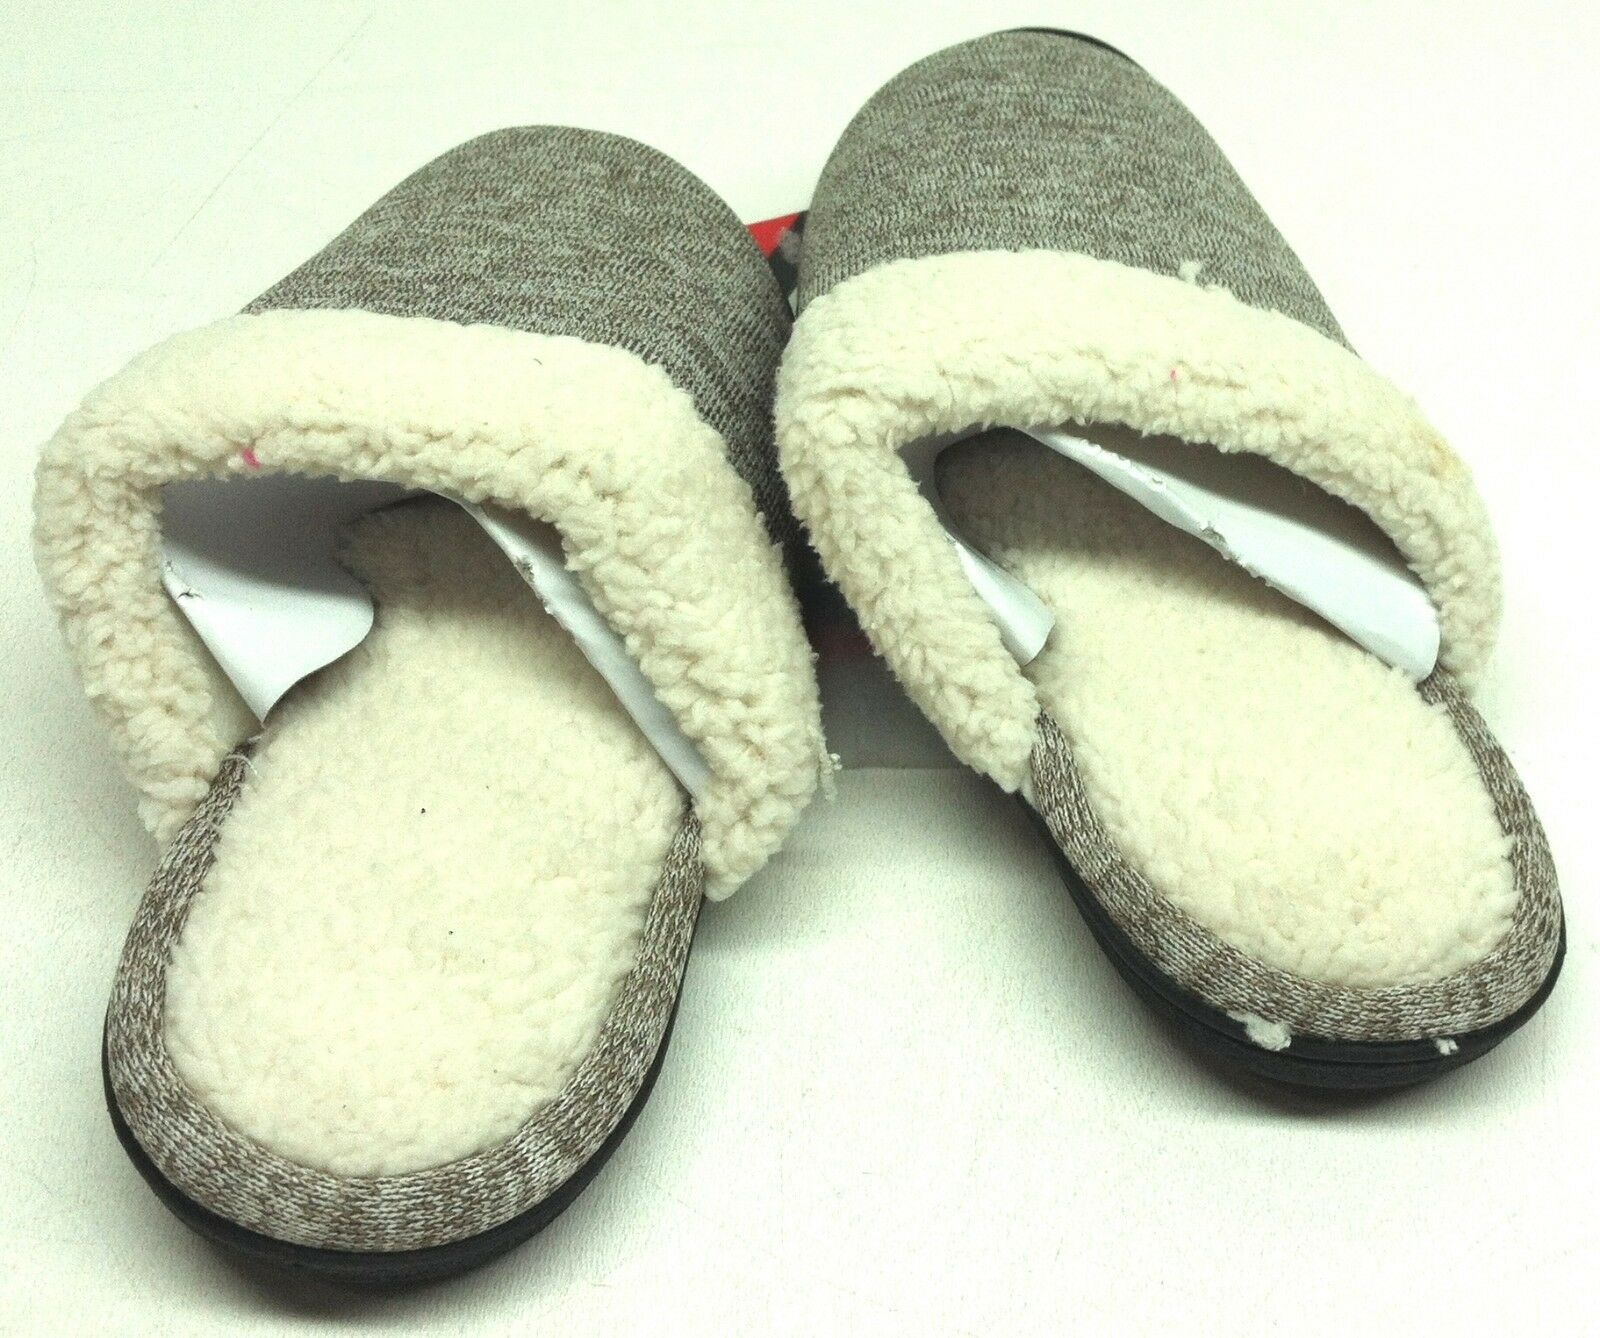 Isotoner Women's Kiley Knit Hoodback Clog Slip On Slippers Size 7.5 - 8